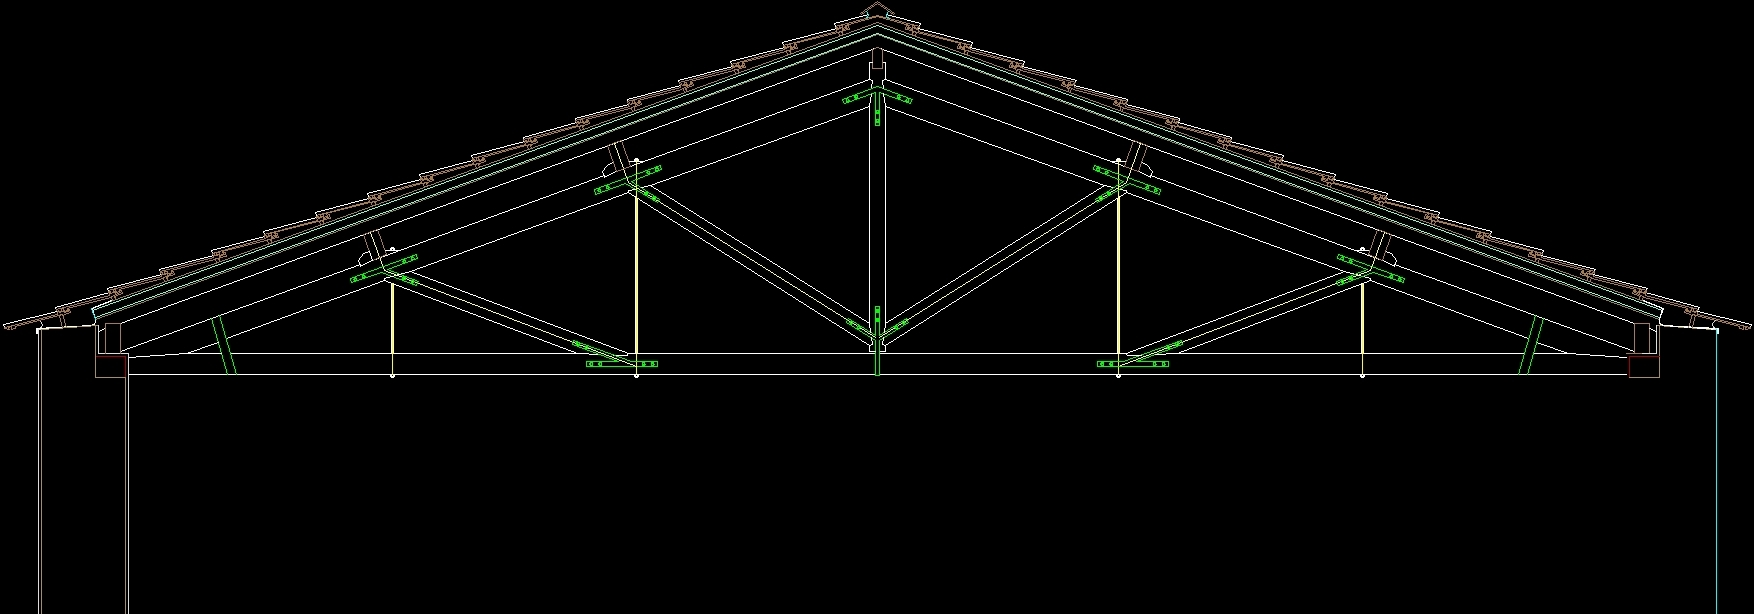 Tile Wooden Roof DWG Detail for AutoCAD • DesignsCAD